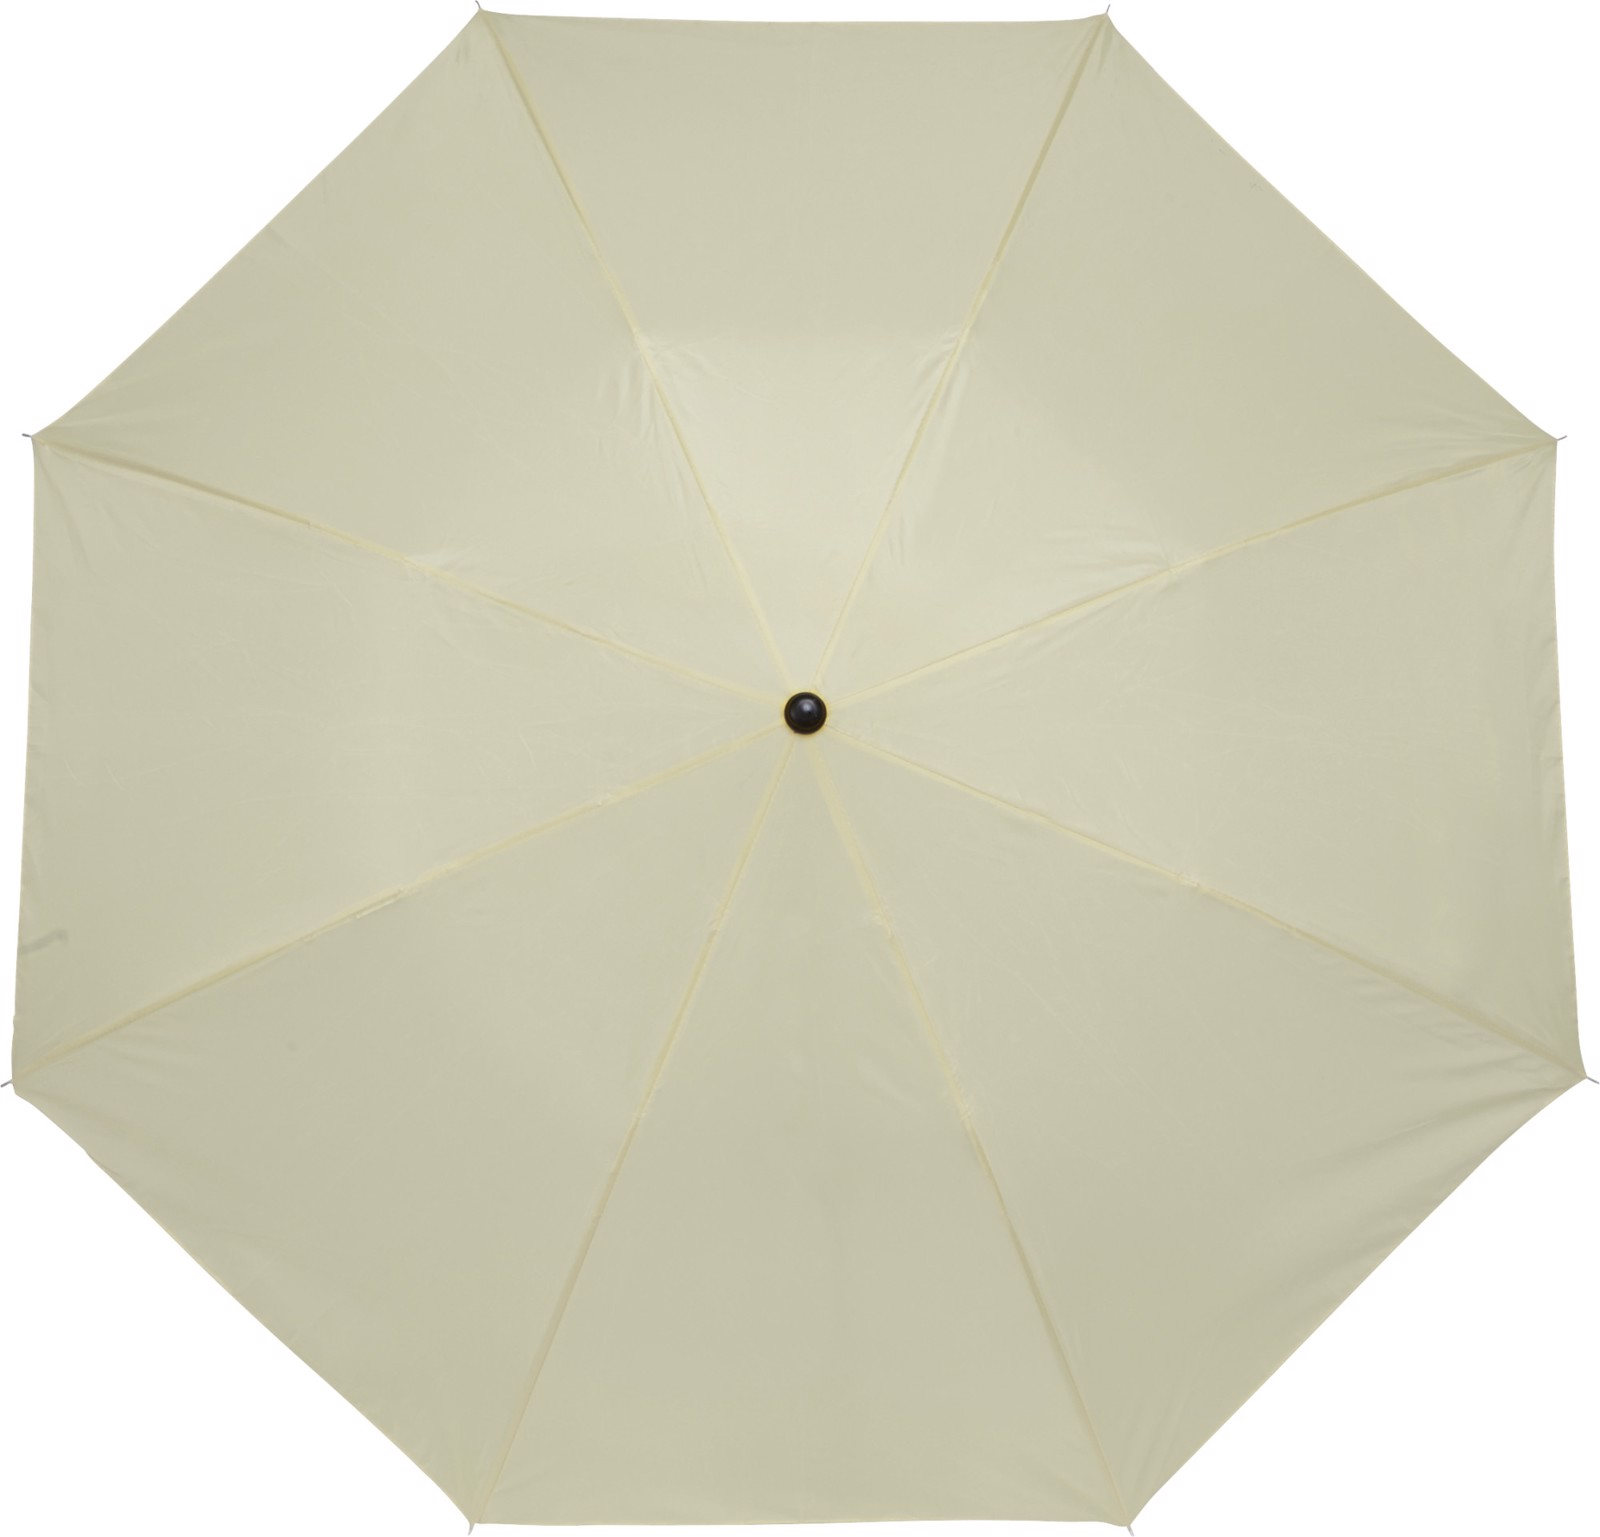 Polyester (190T) umbrella - Khaki